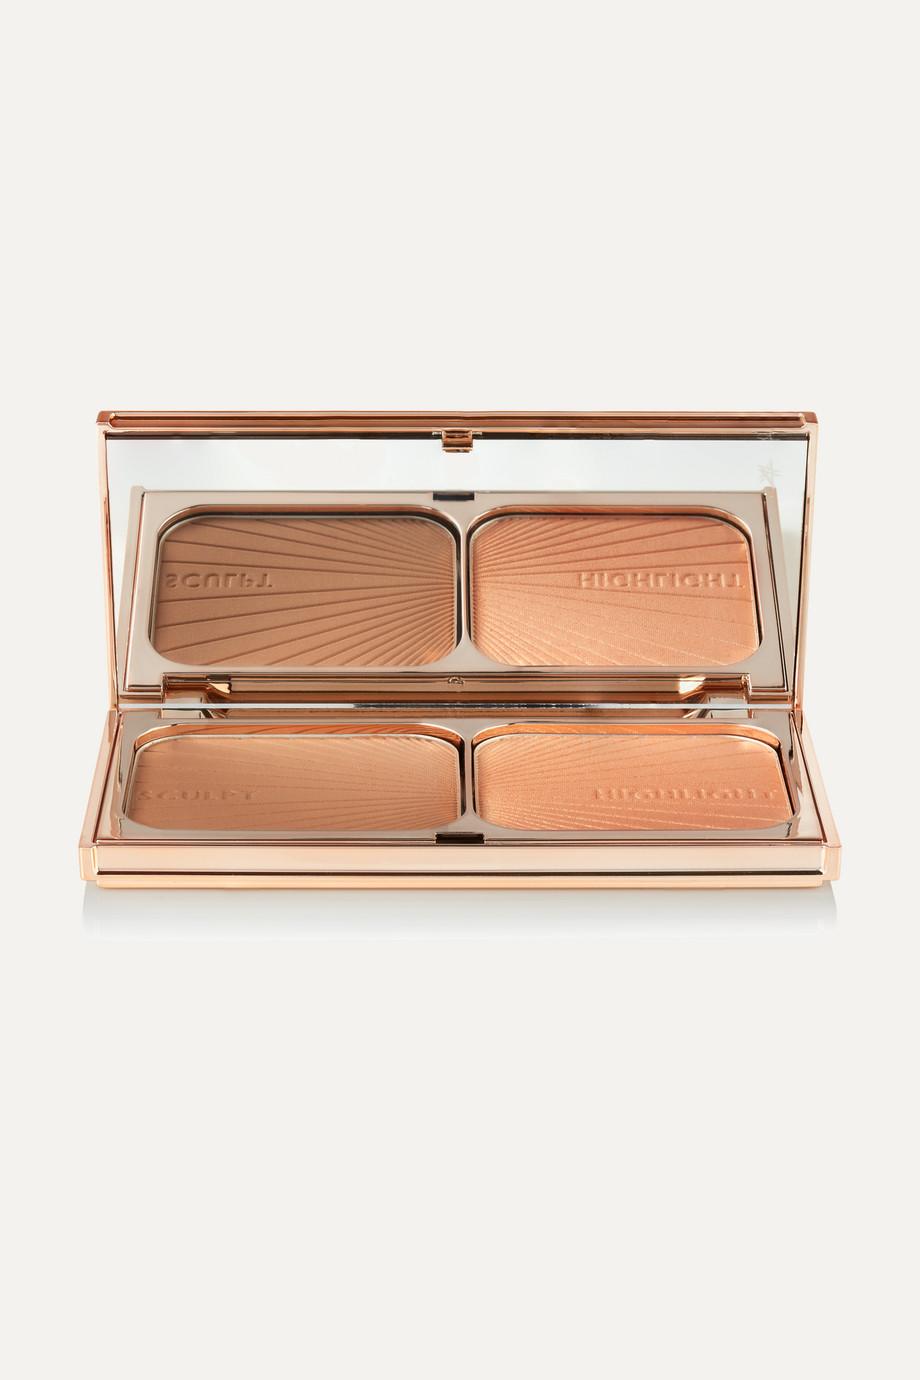 Charlotte Tilbury Filmstar Bronze & Glow – Medium to Dark, 12,5 g – Puder-Duo